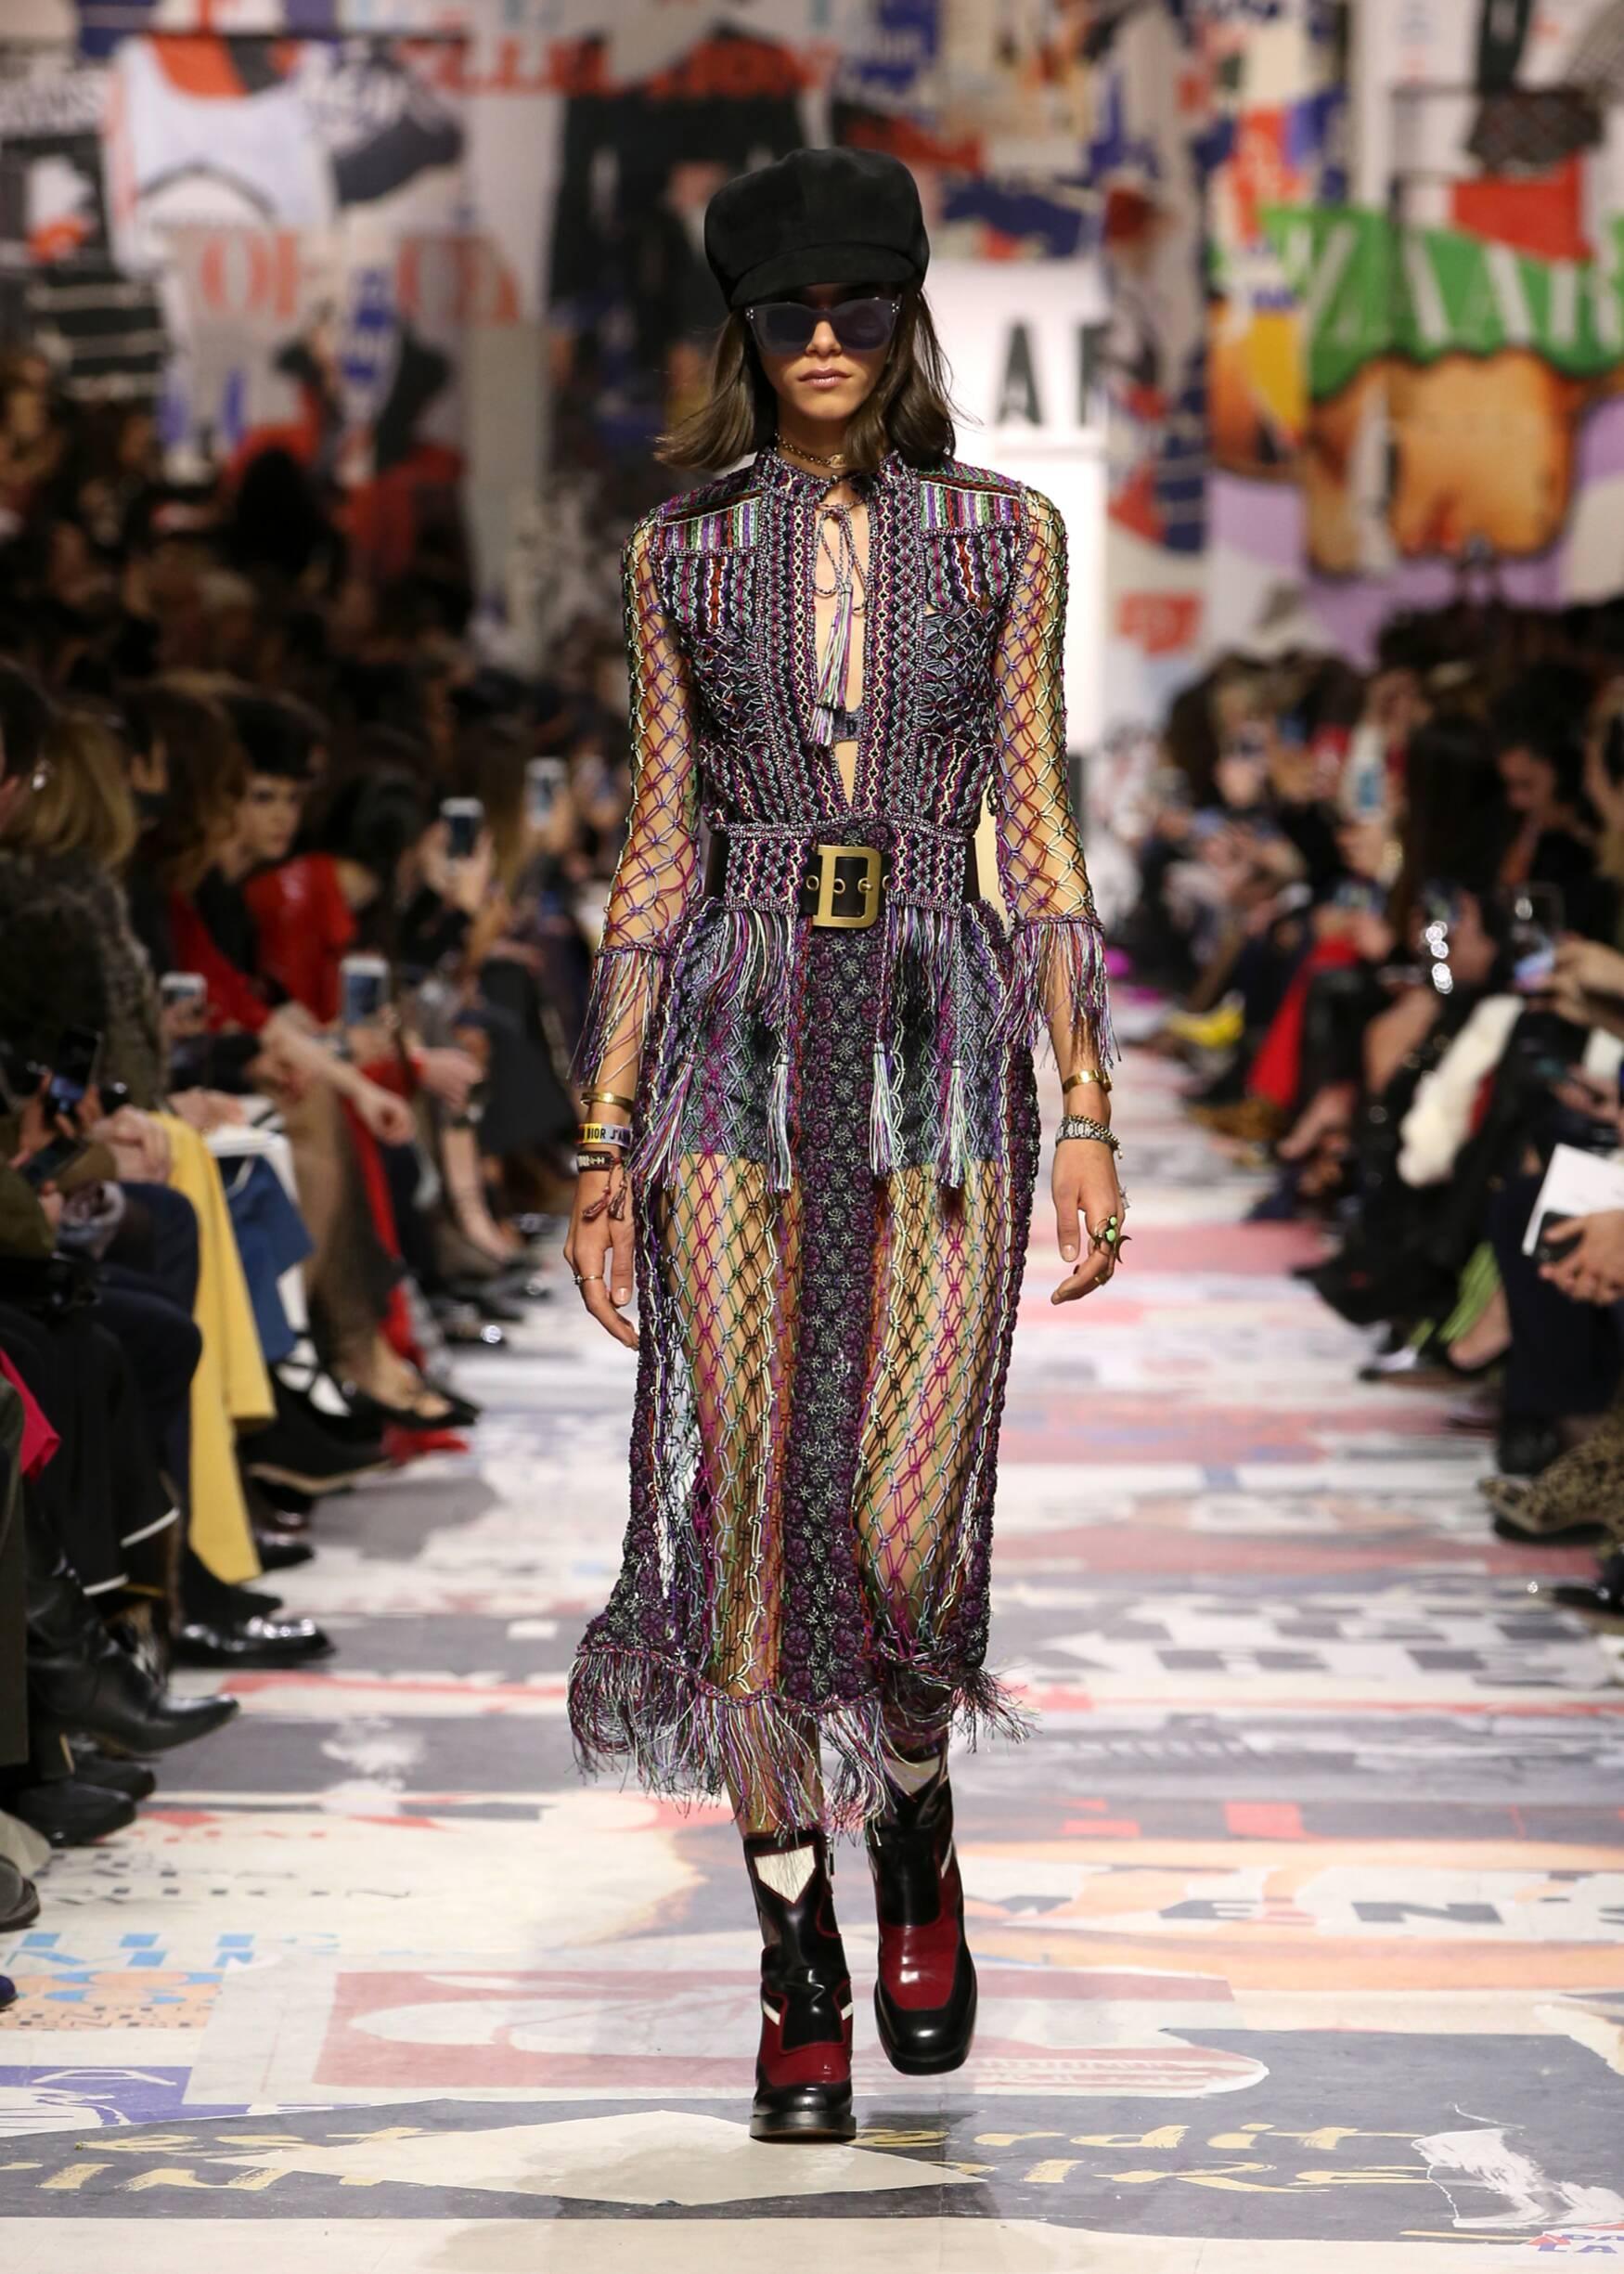 Dior Fall 2018 Catwalk